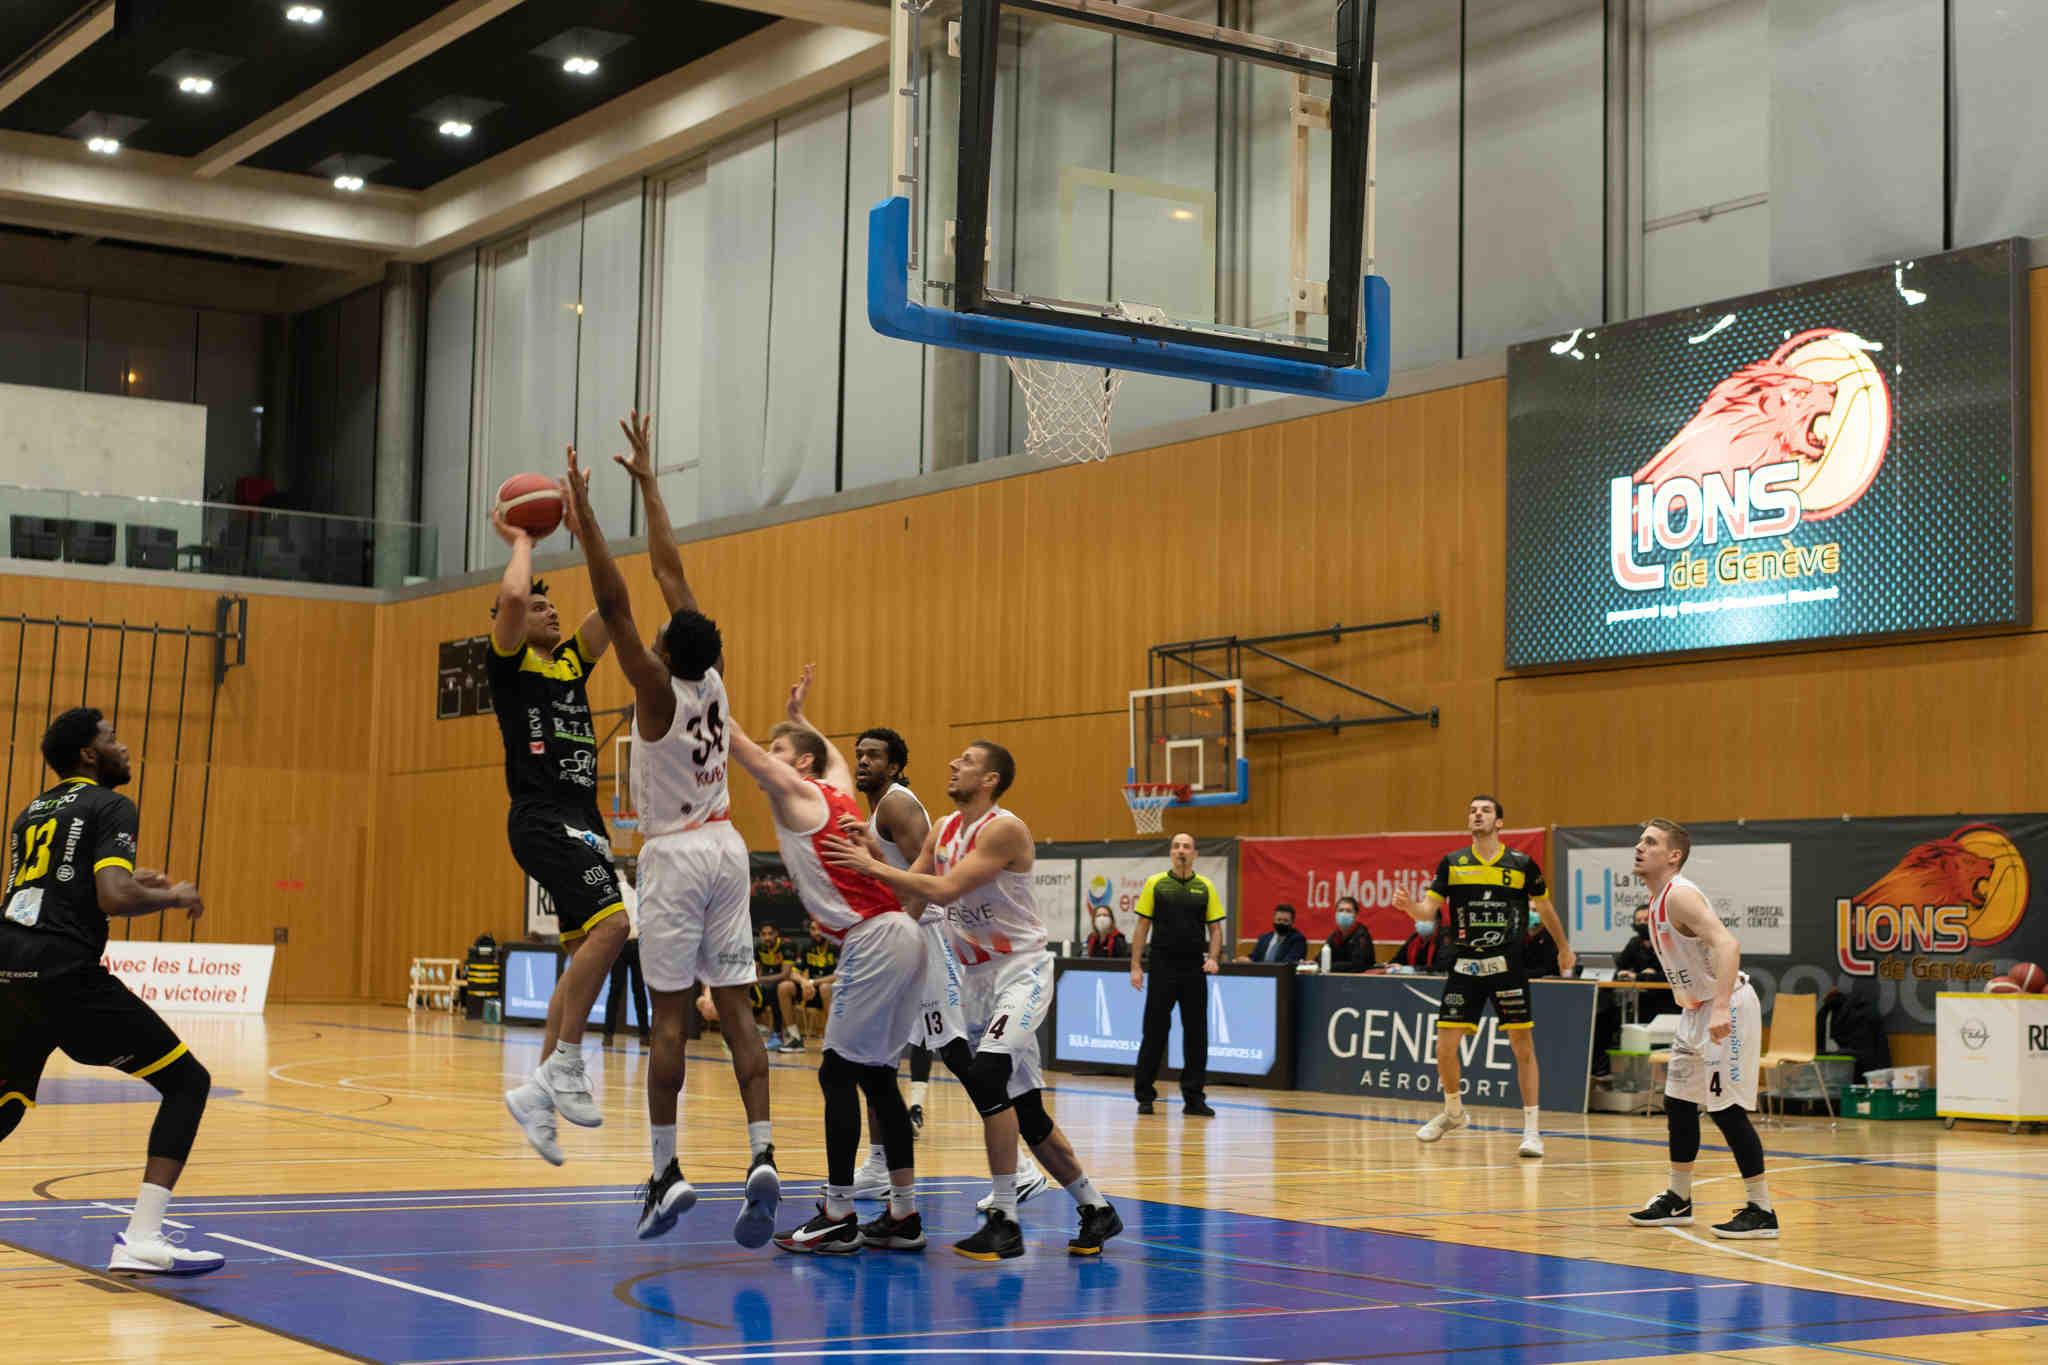 Basket: Fritschi brille grâce au collectif